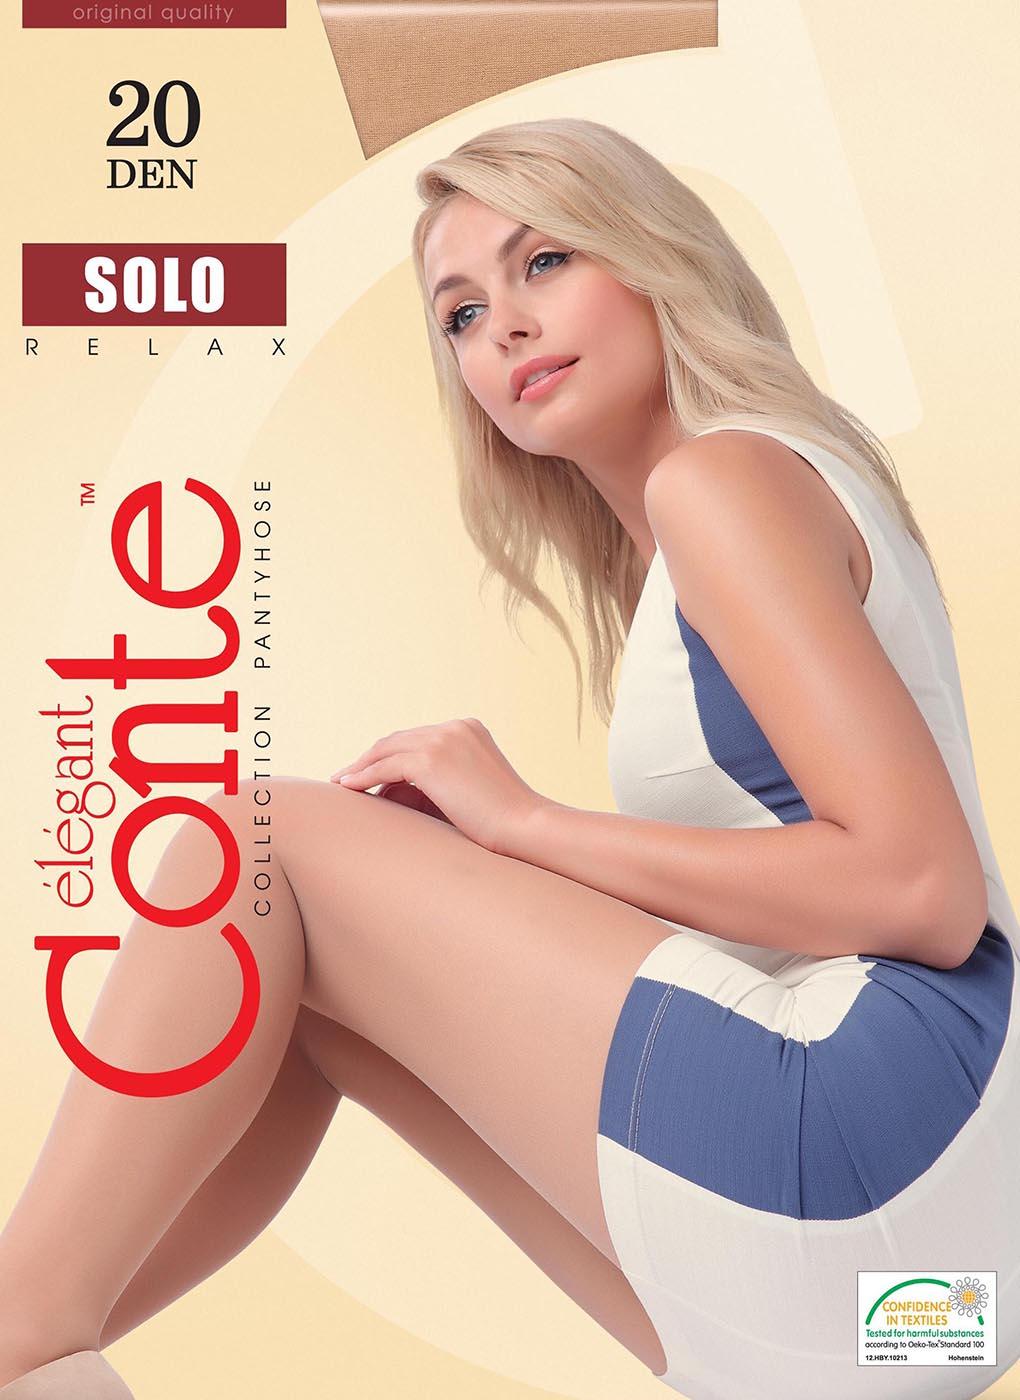 Колготки женские Solo 20 Den 04, Conte elegant фото